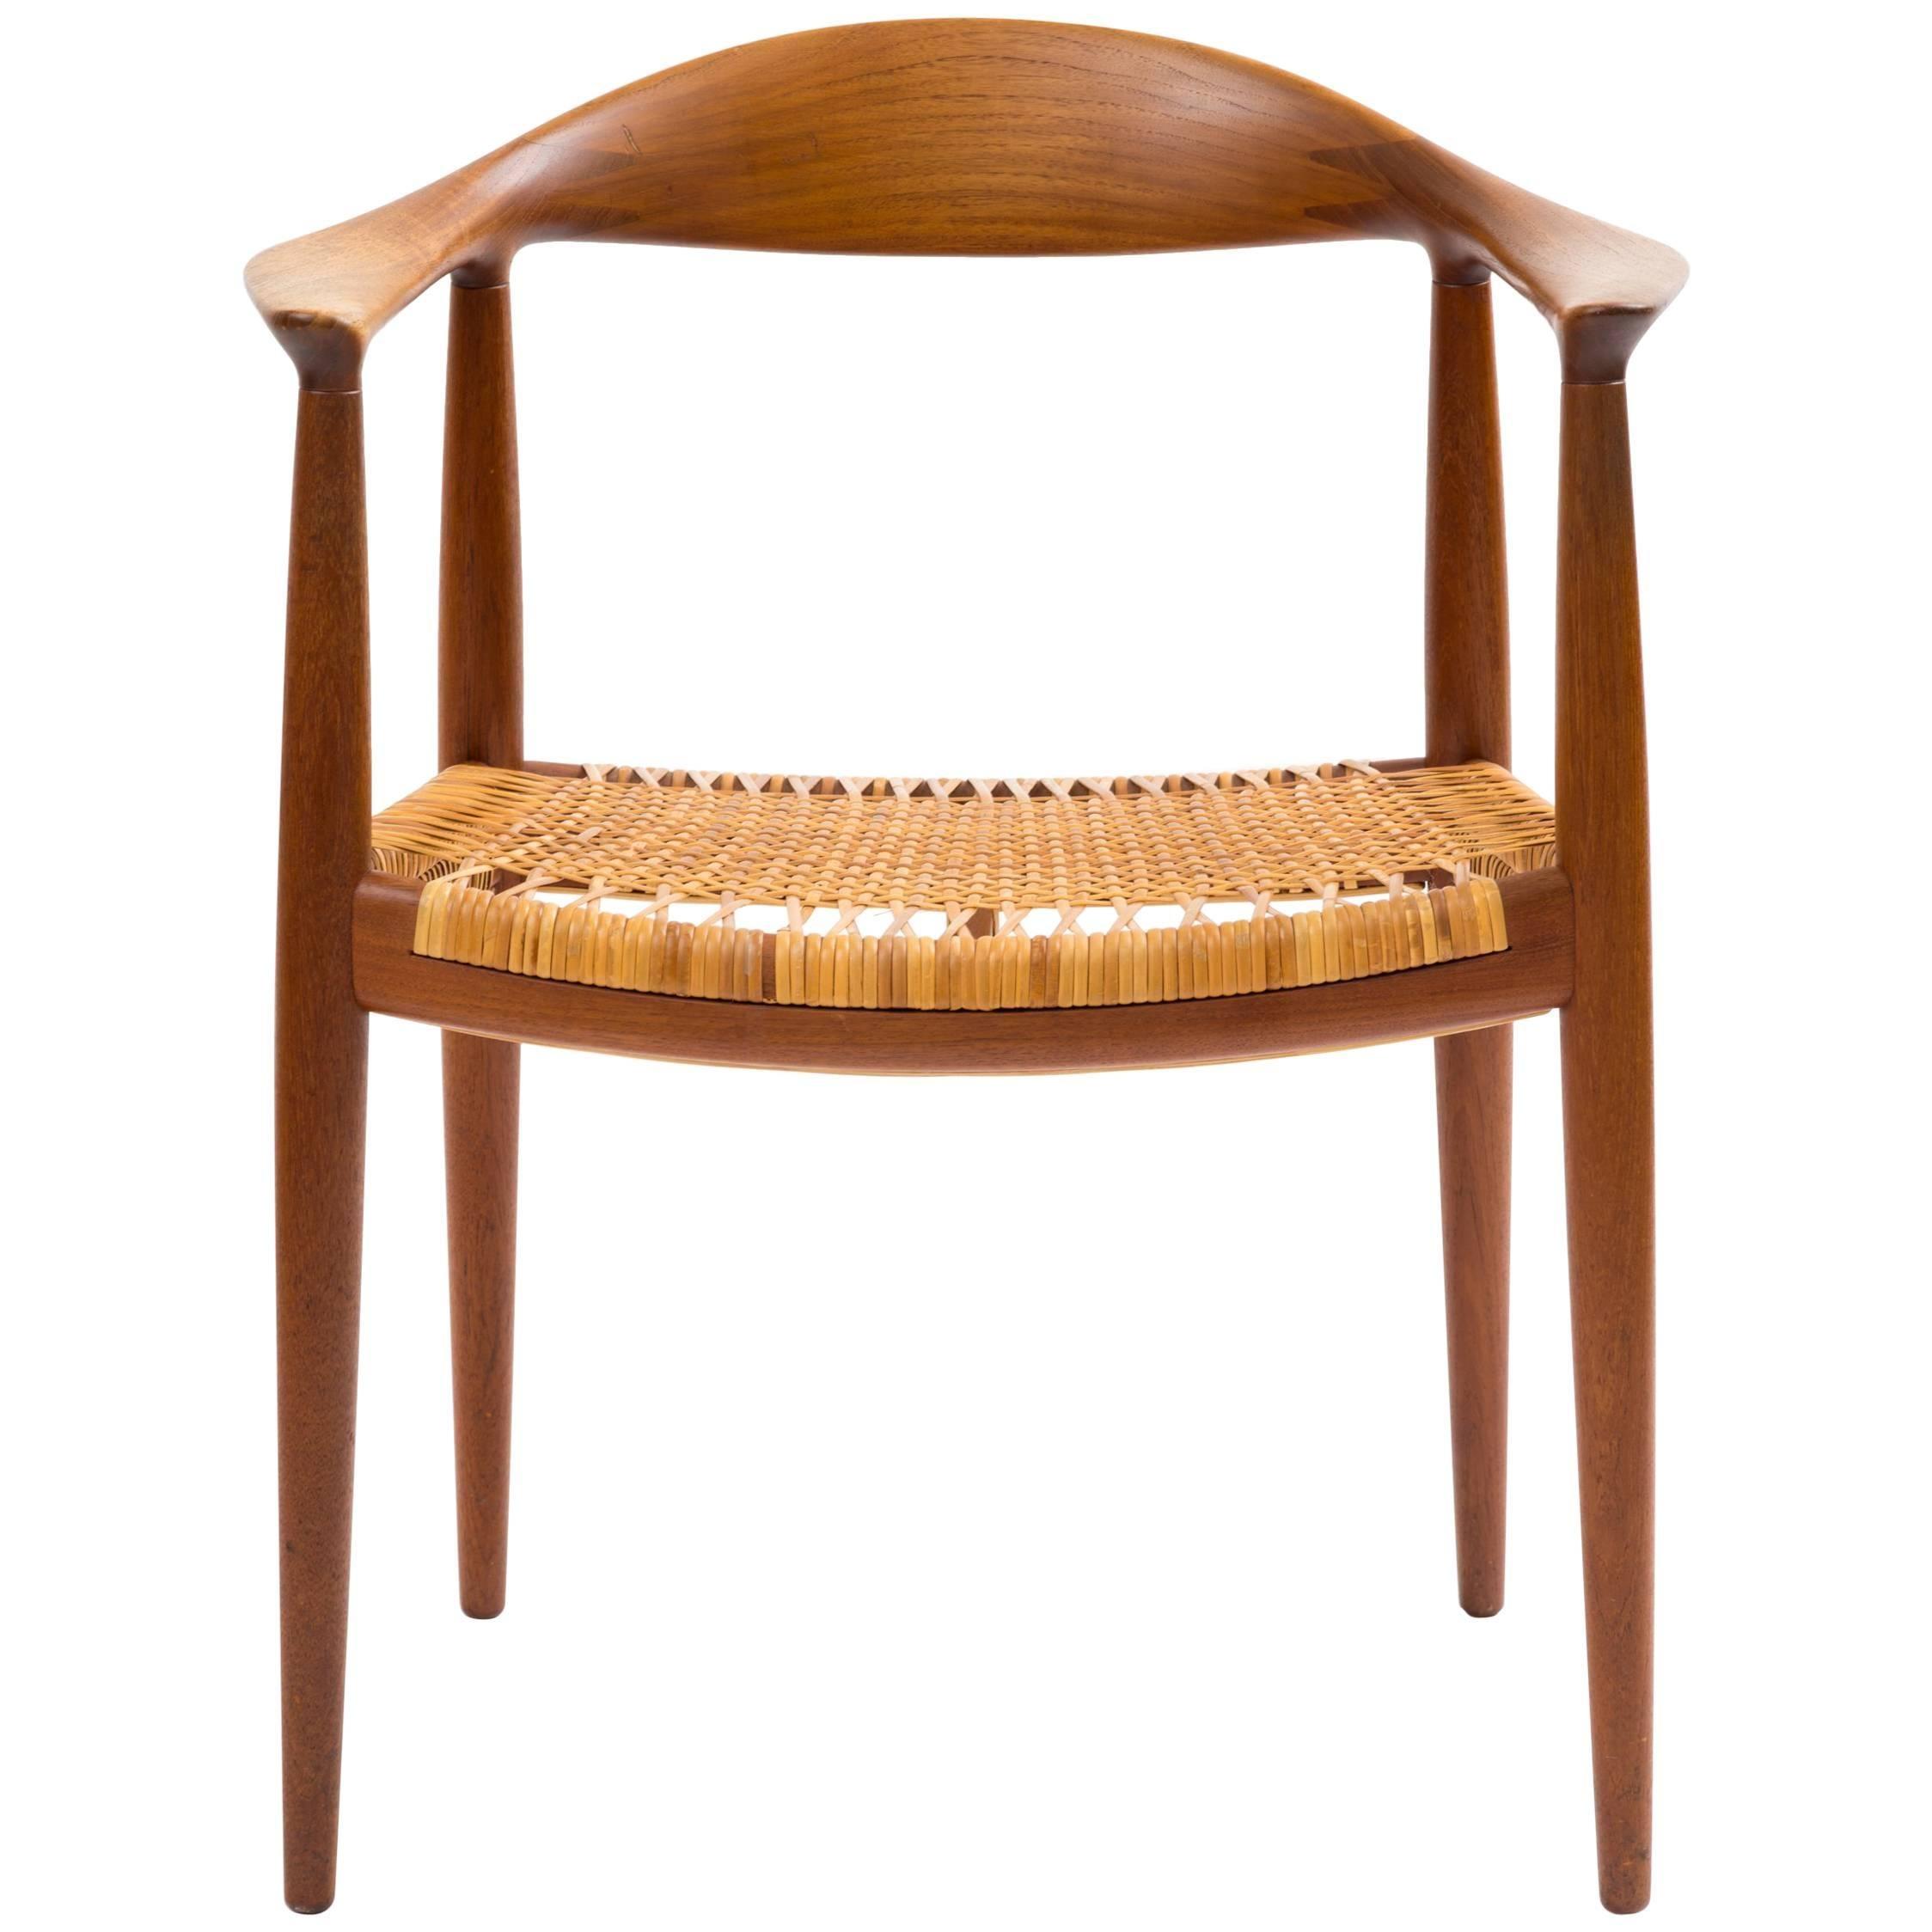 Hans J Wegner The Chair Model JH501 in Teak with Original Cane Seat